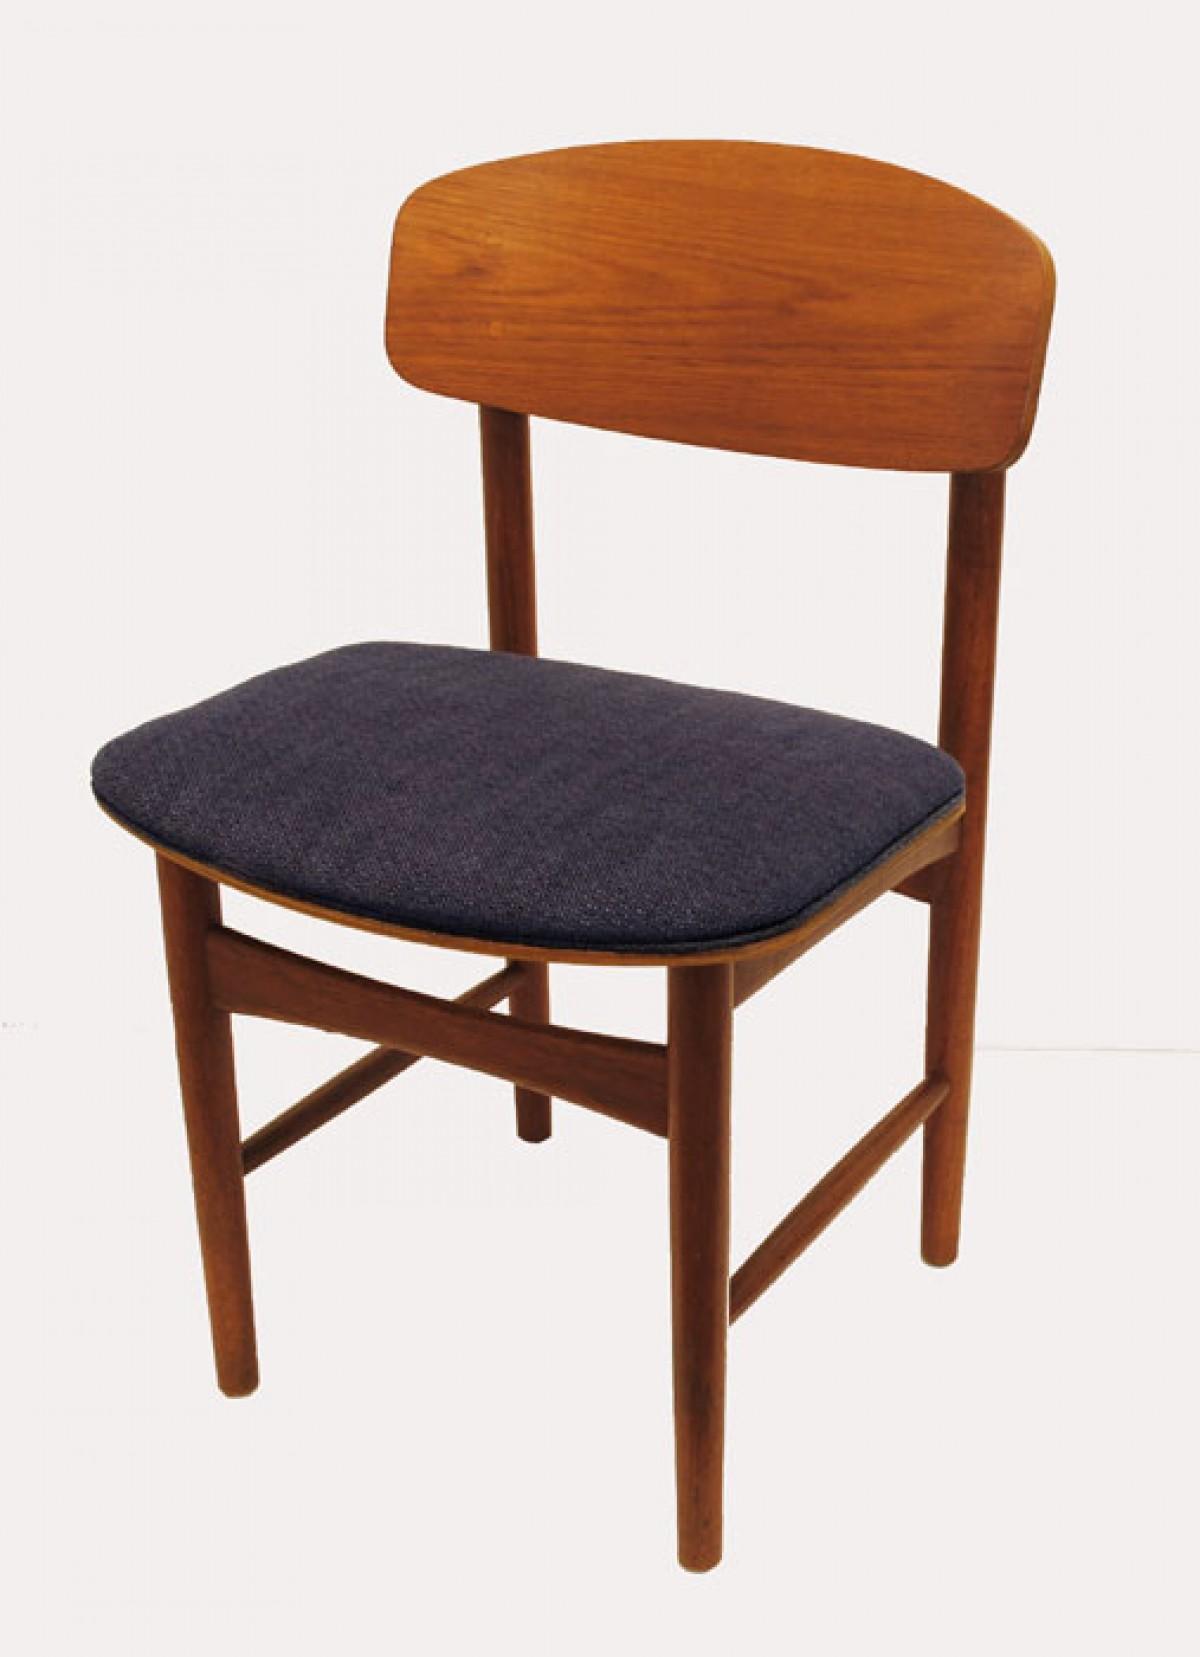 1950 60s Danish Teak Dining Chairs Borge Mogensen